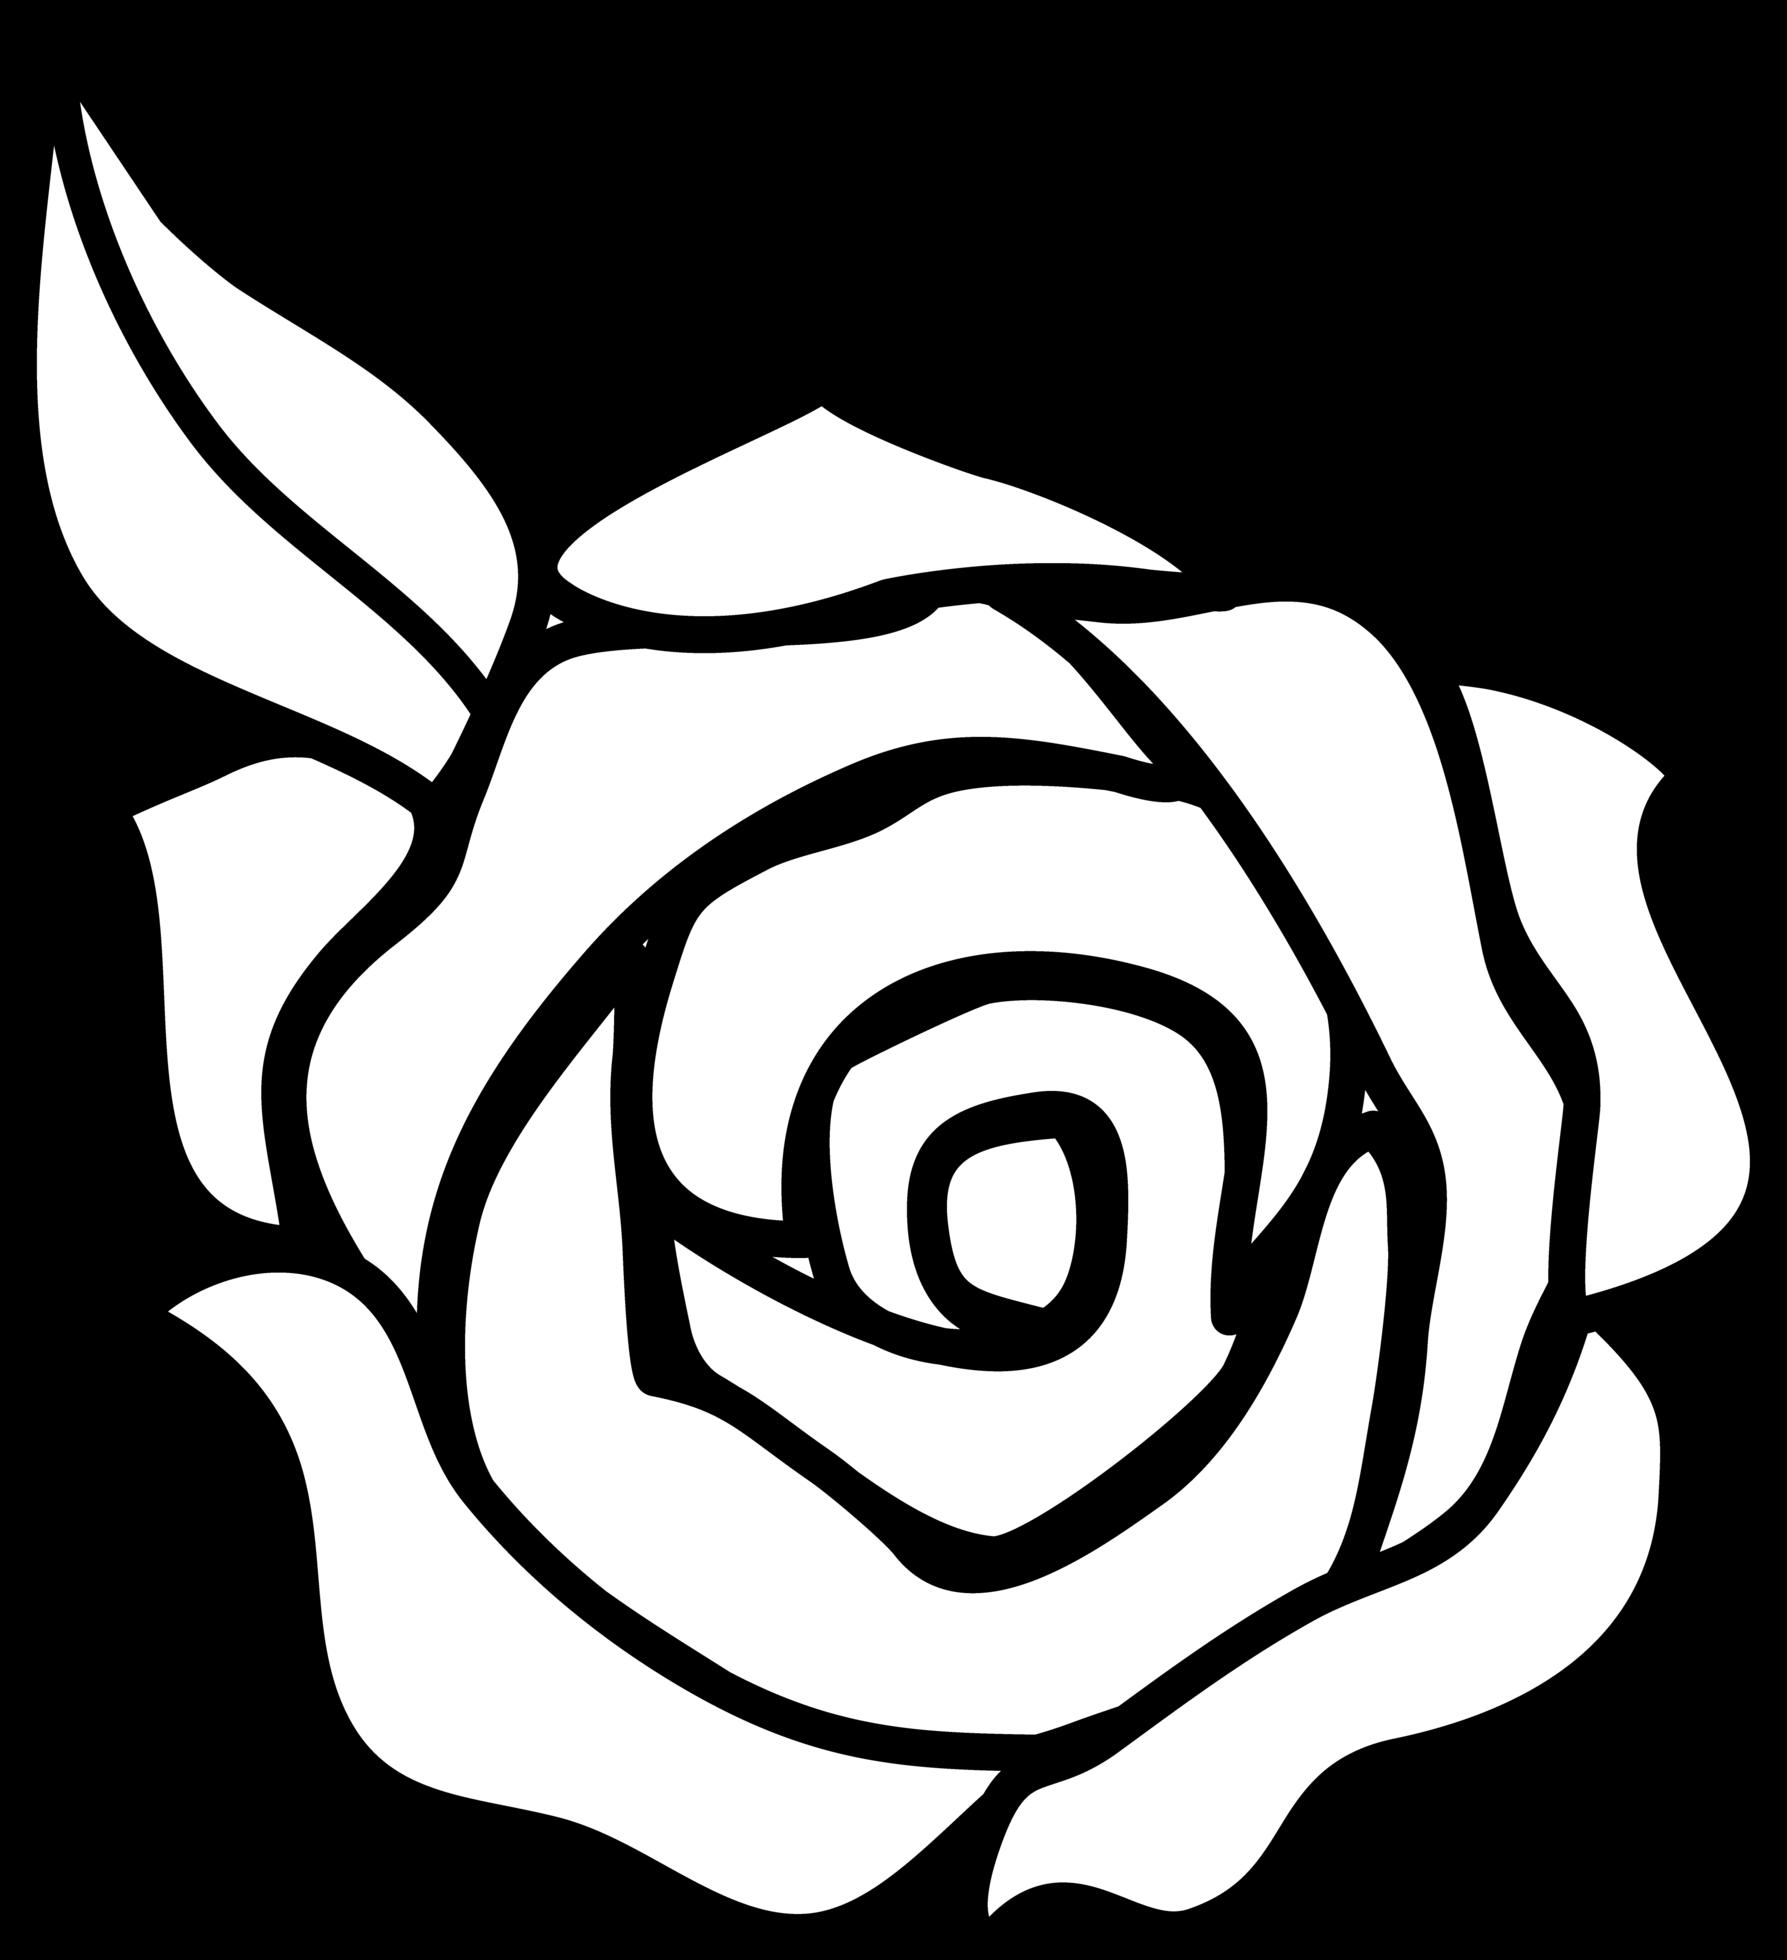 Free Simple Rose Drawings, Download Free Simple Rose ... - Beautiful Black and White Roses